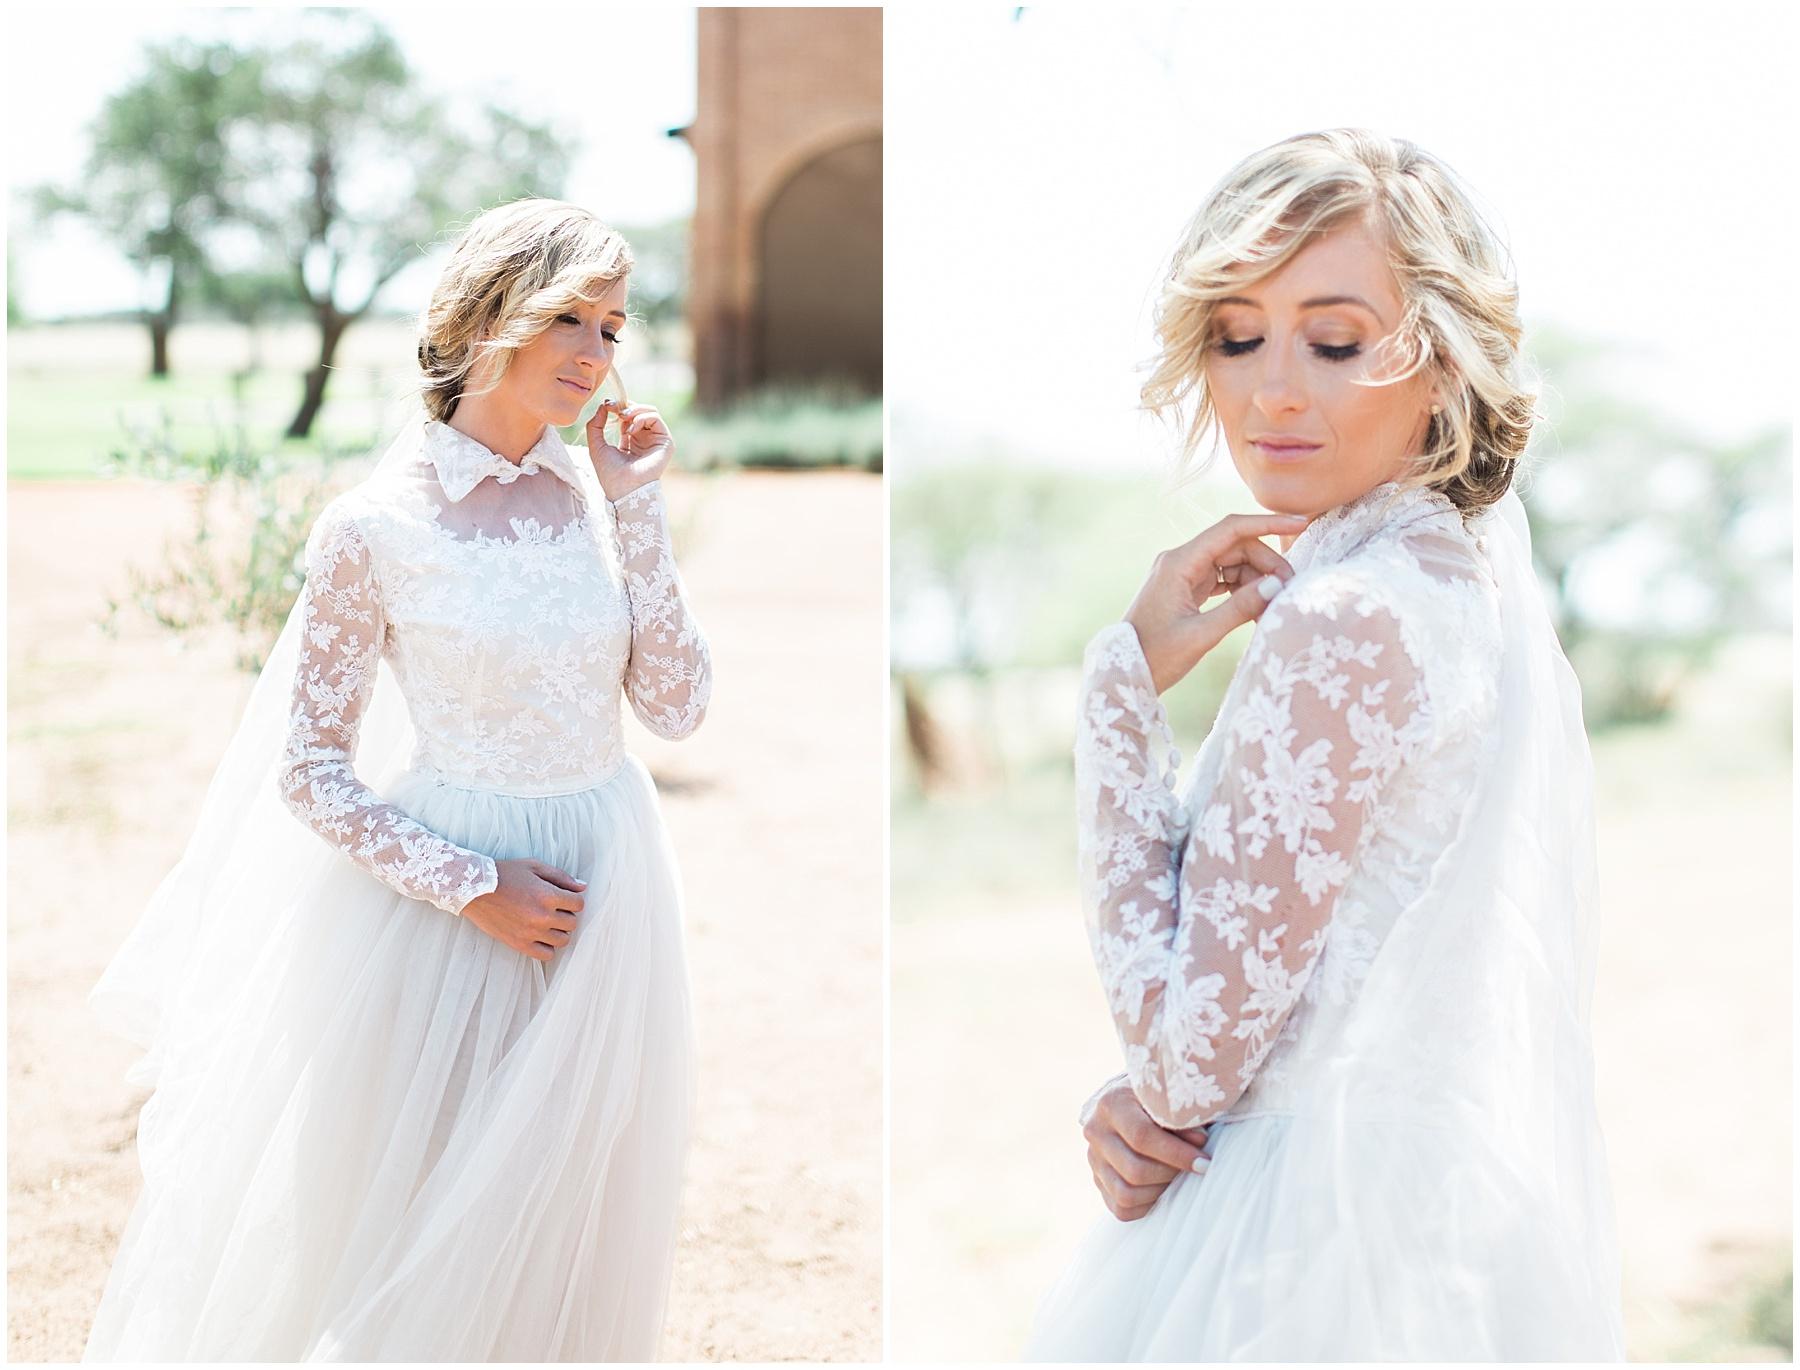 AliciaLandman_JoleneandZander_Wedding_The Pretty Blog_0432.jpg